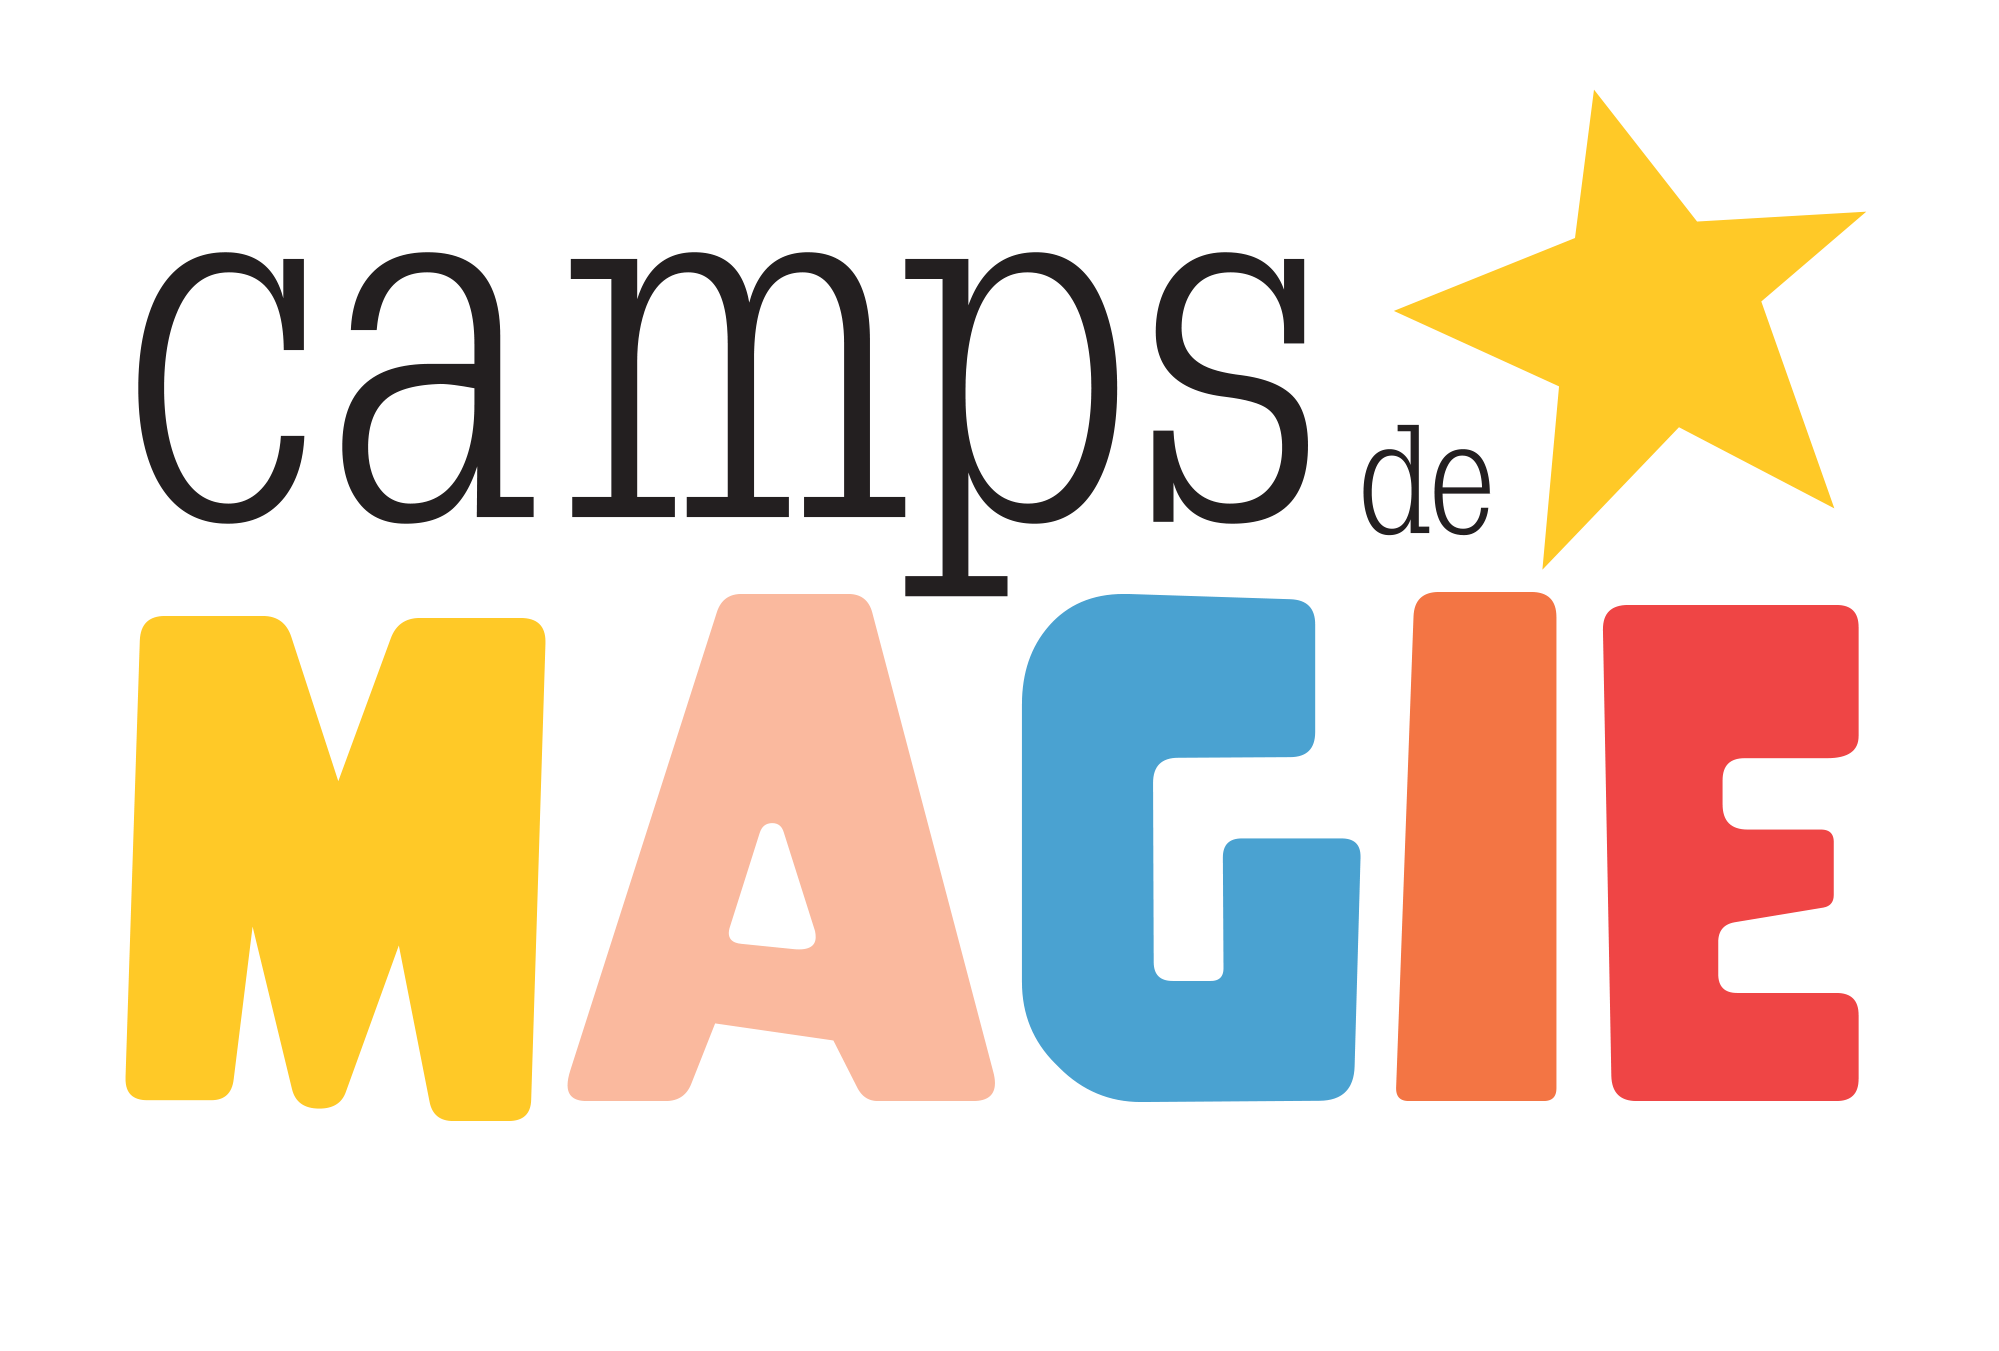 Camps de magie Logo copie